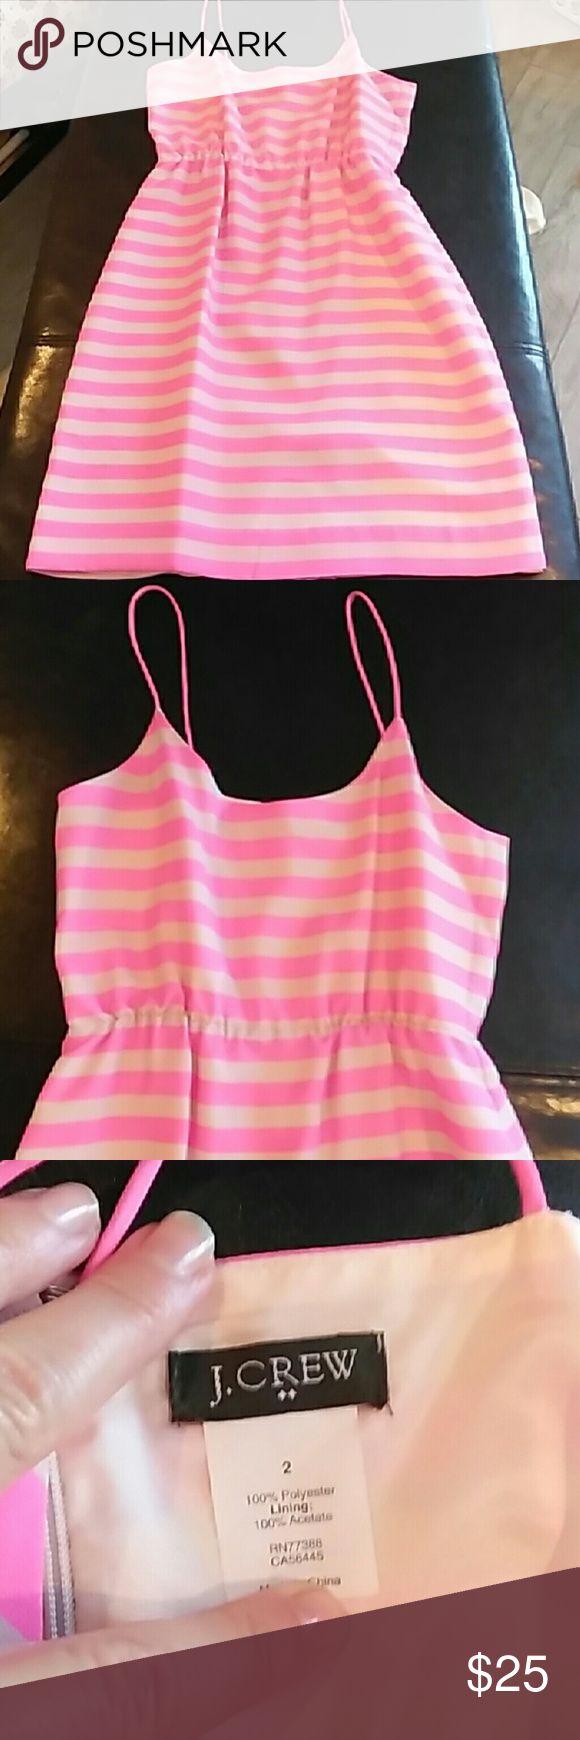 J Crew dress Pink and light pink striped dress, NEVER WORN,  hits at the knee J. Crew Dresses Midi